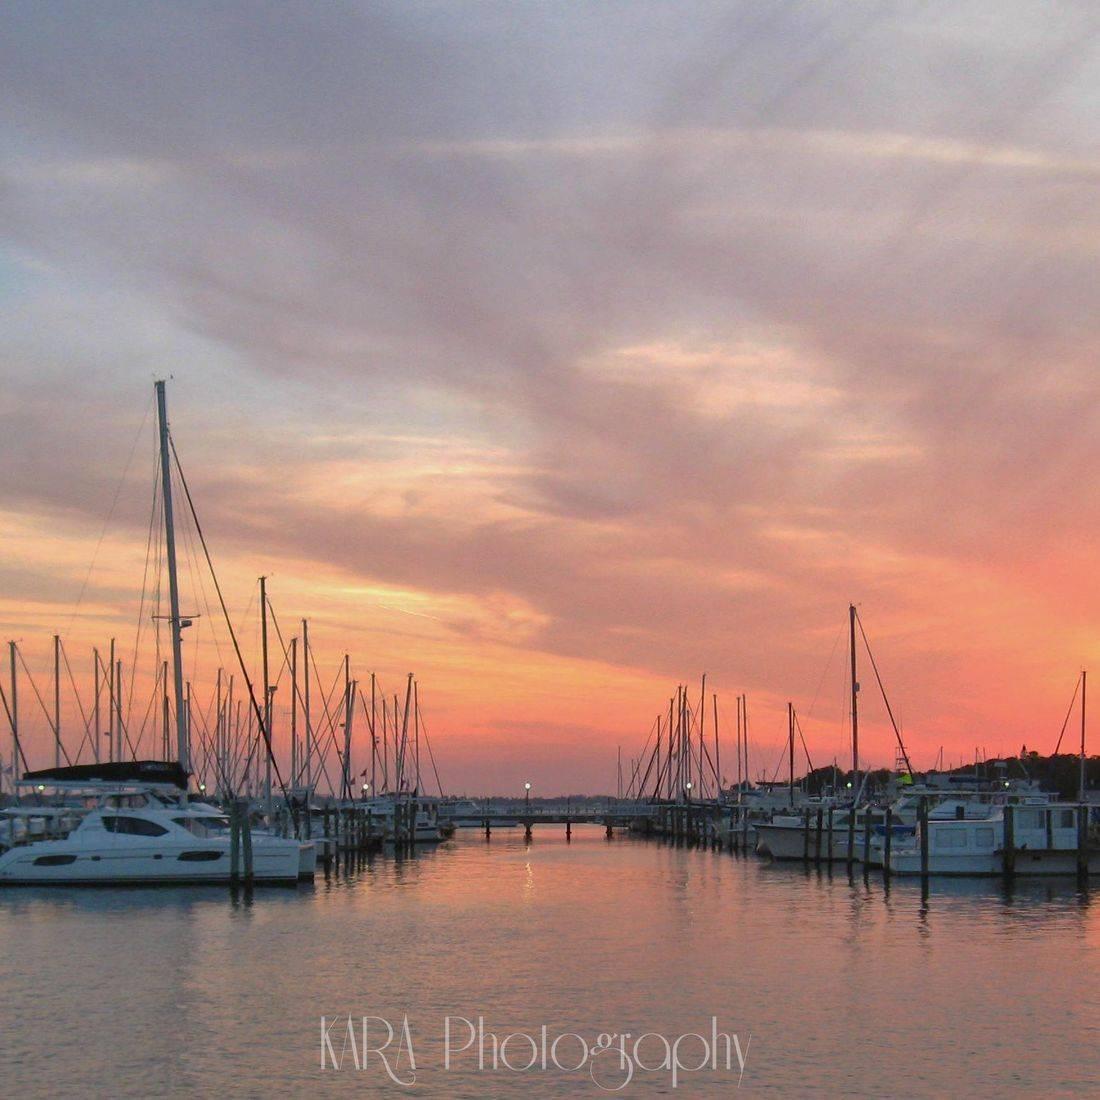 Palmetto, Florida, Sunset, Marina, Gulf of Mexico